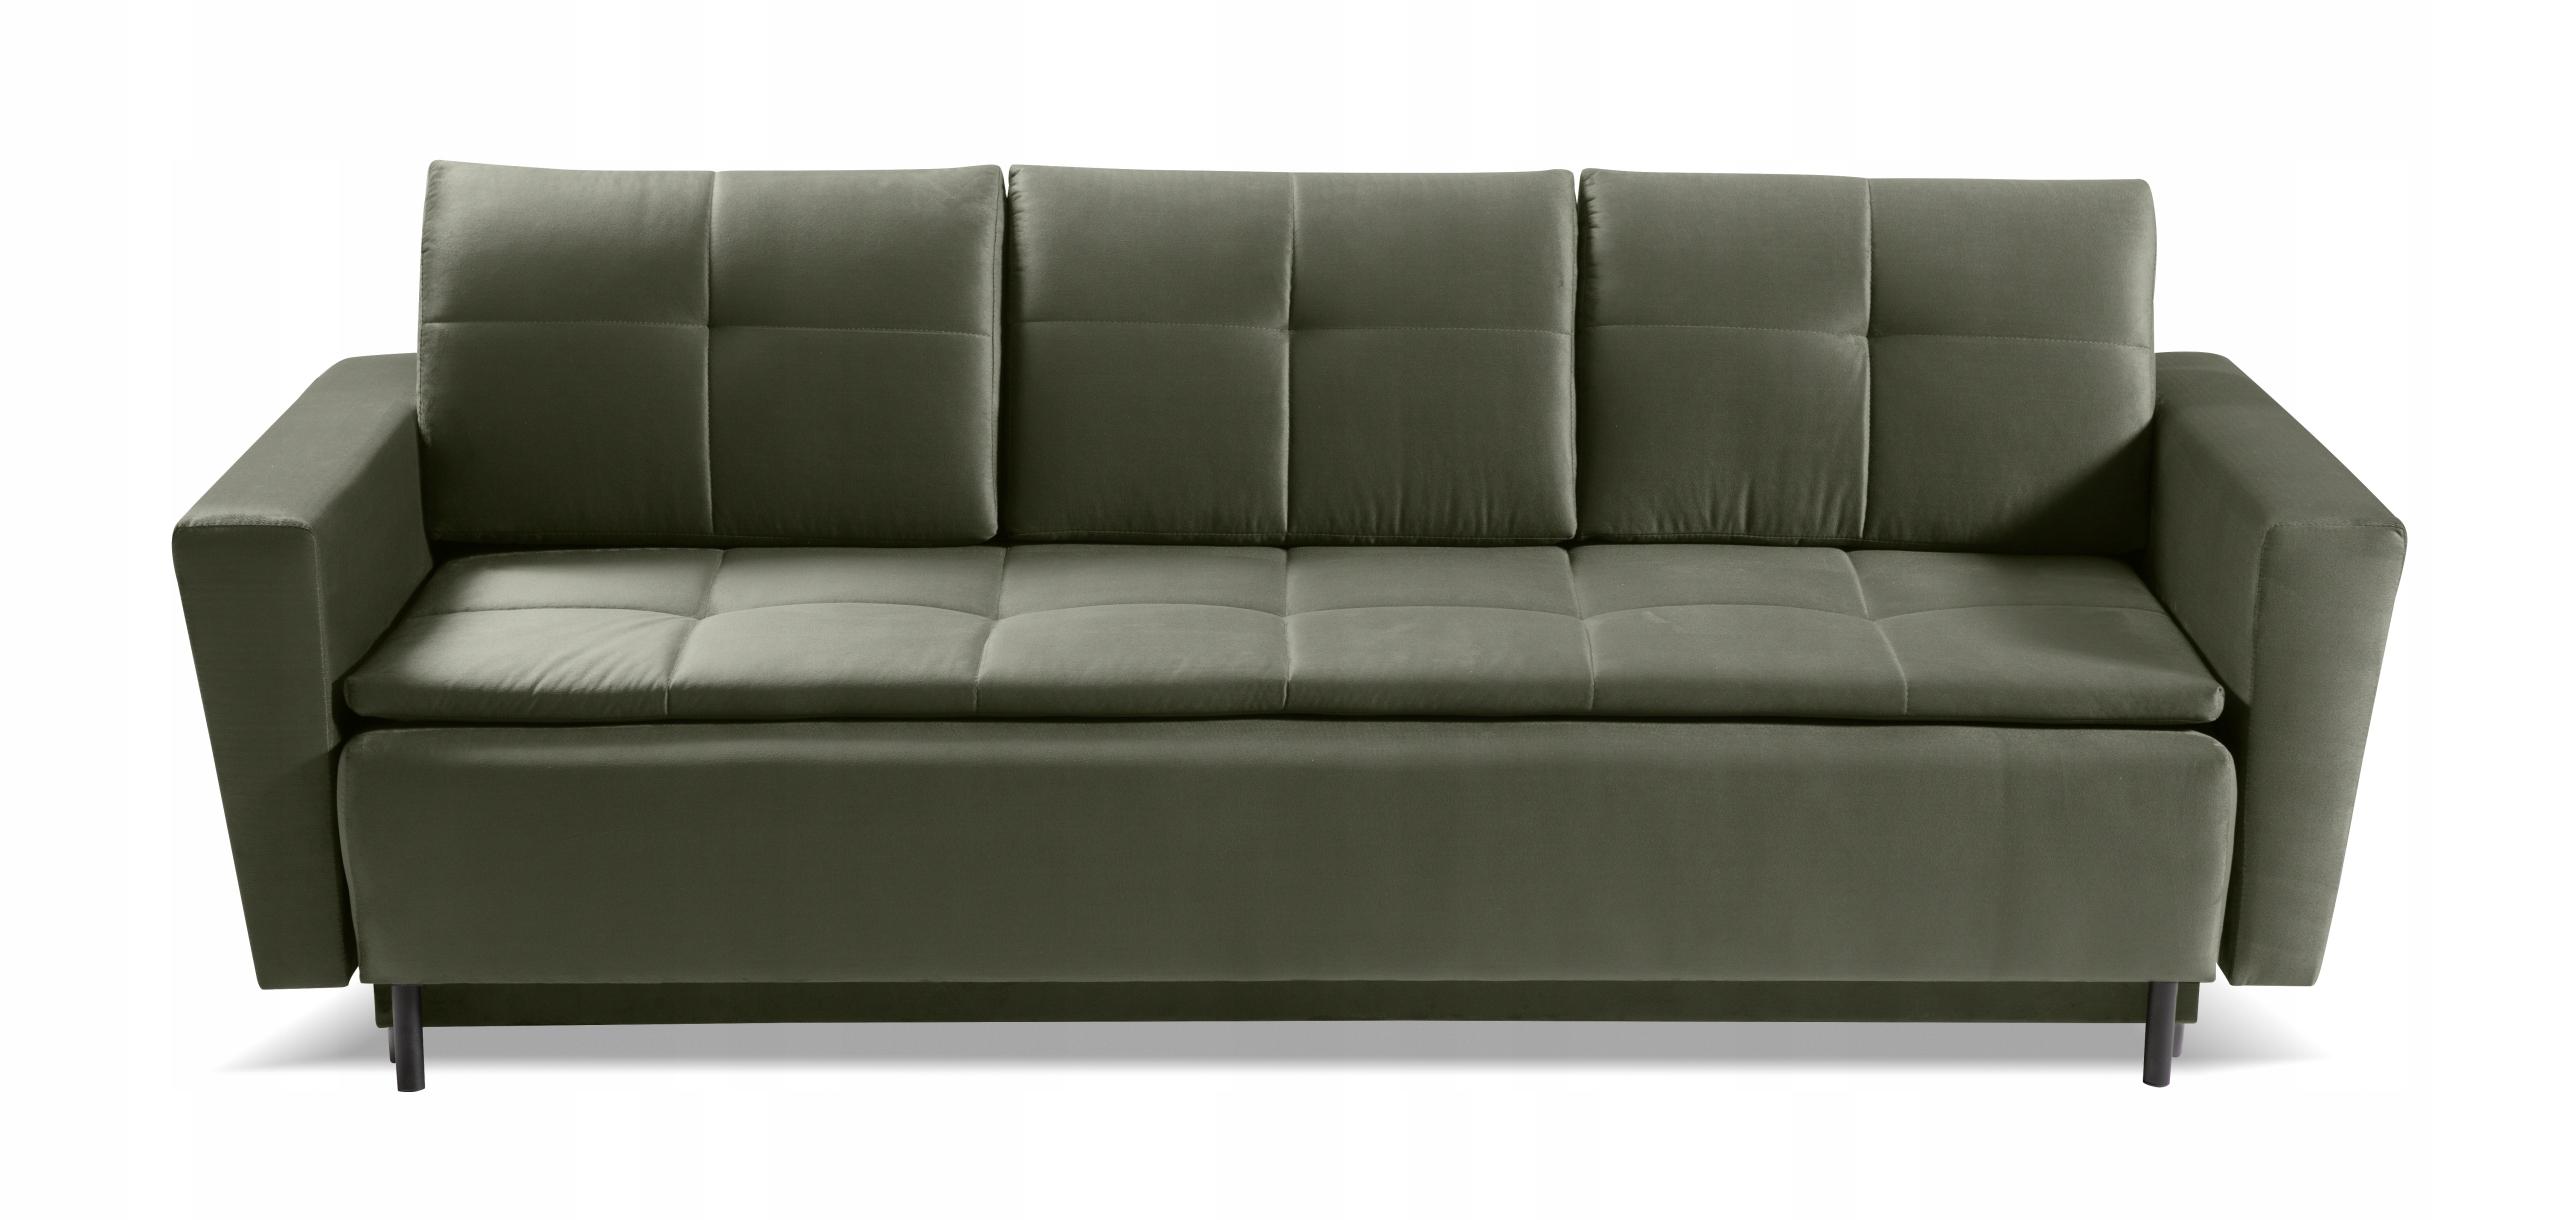 Großes Sofa SARA Klappsofa - Farben Kollektion ELN60